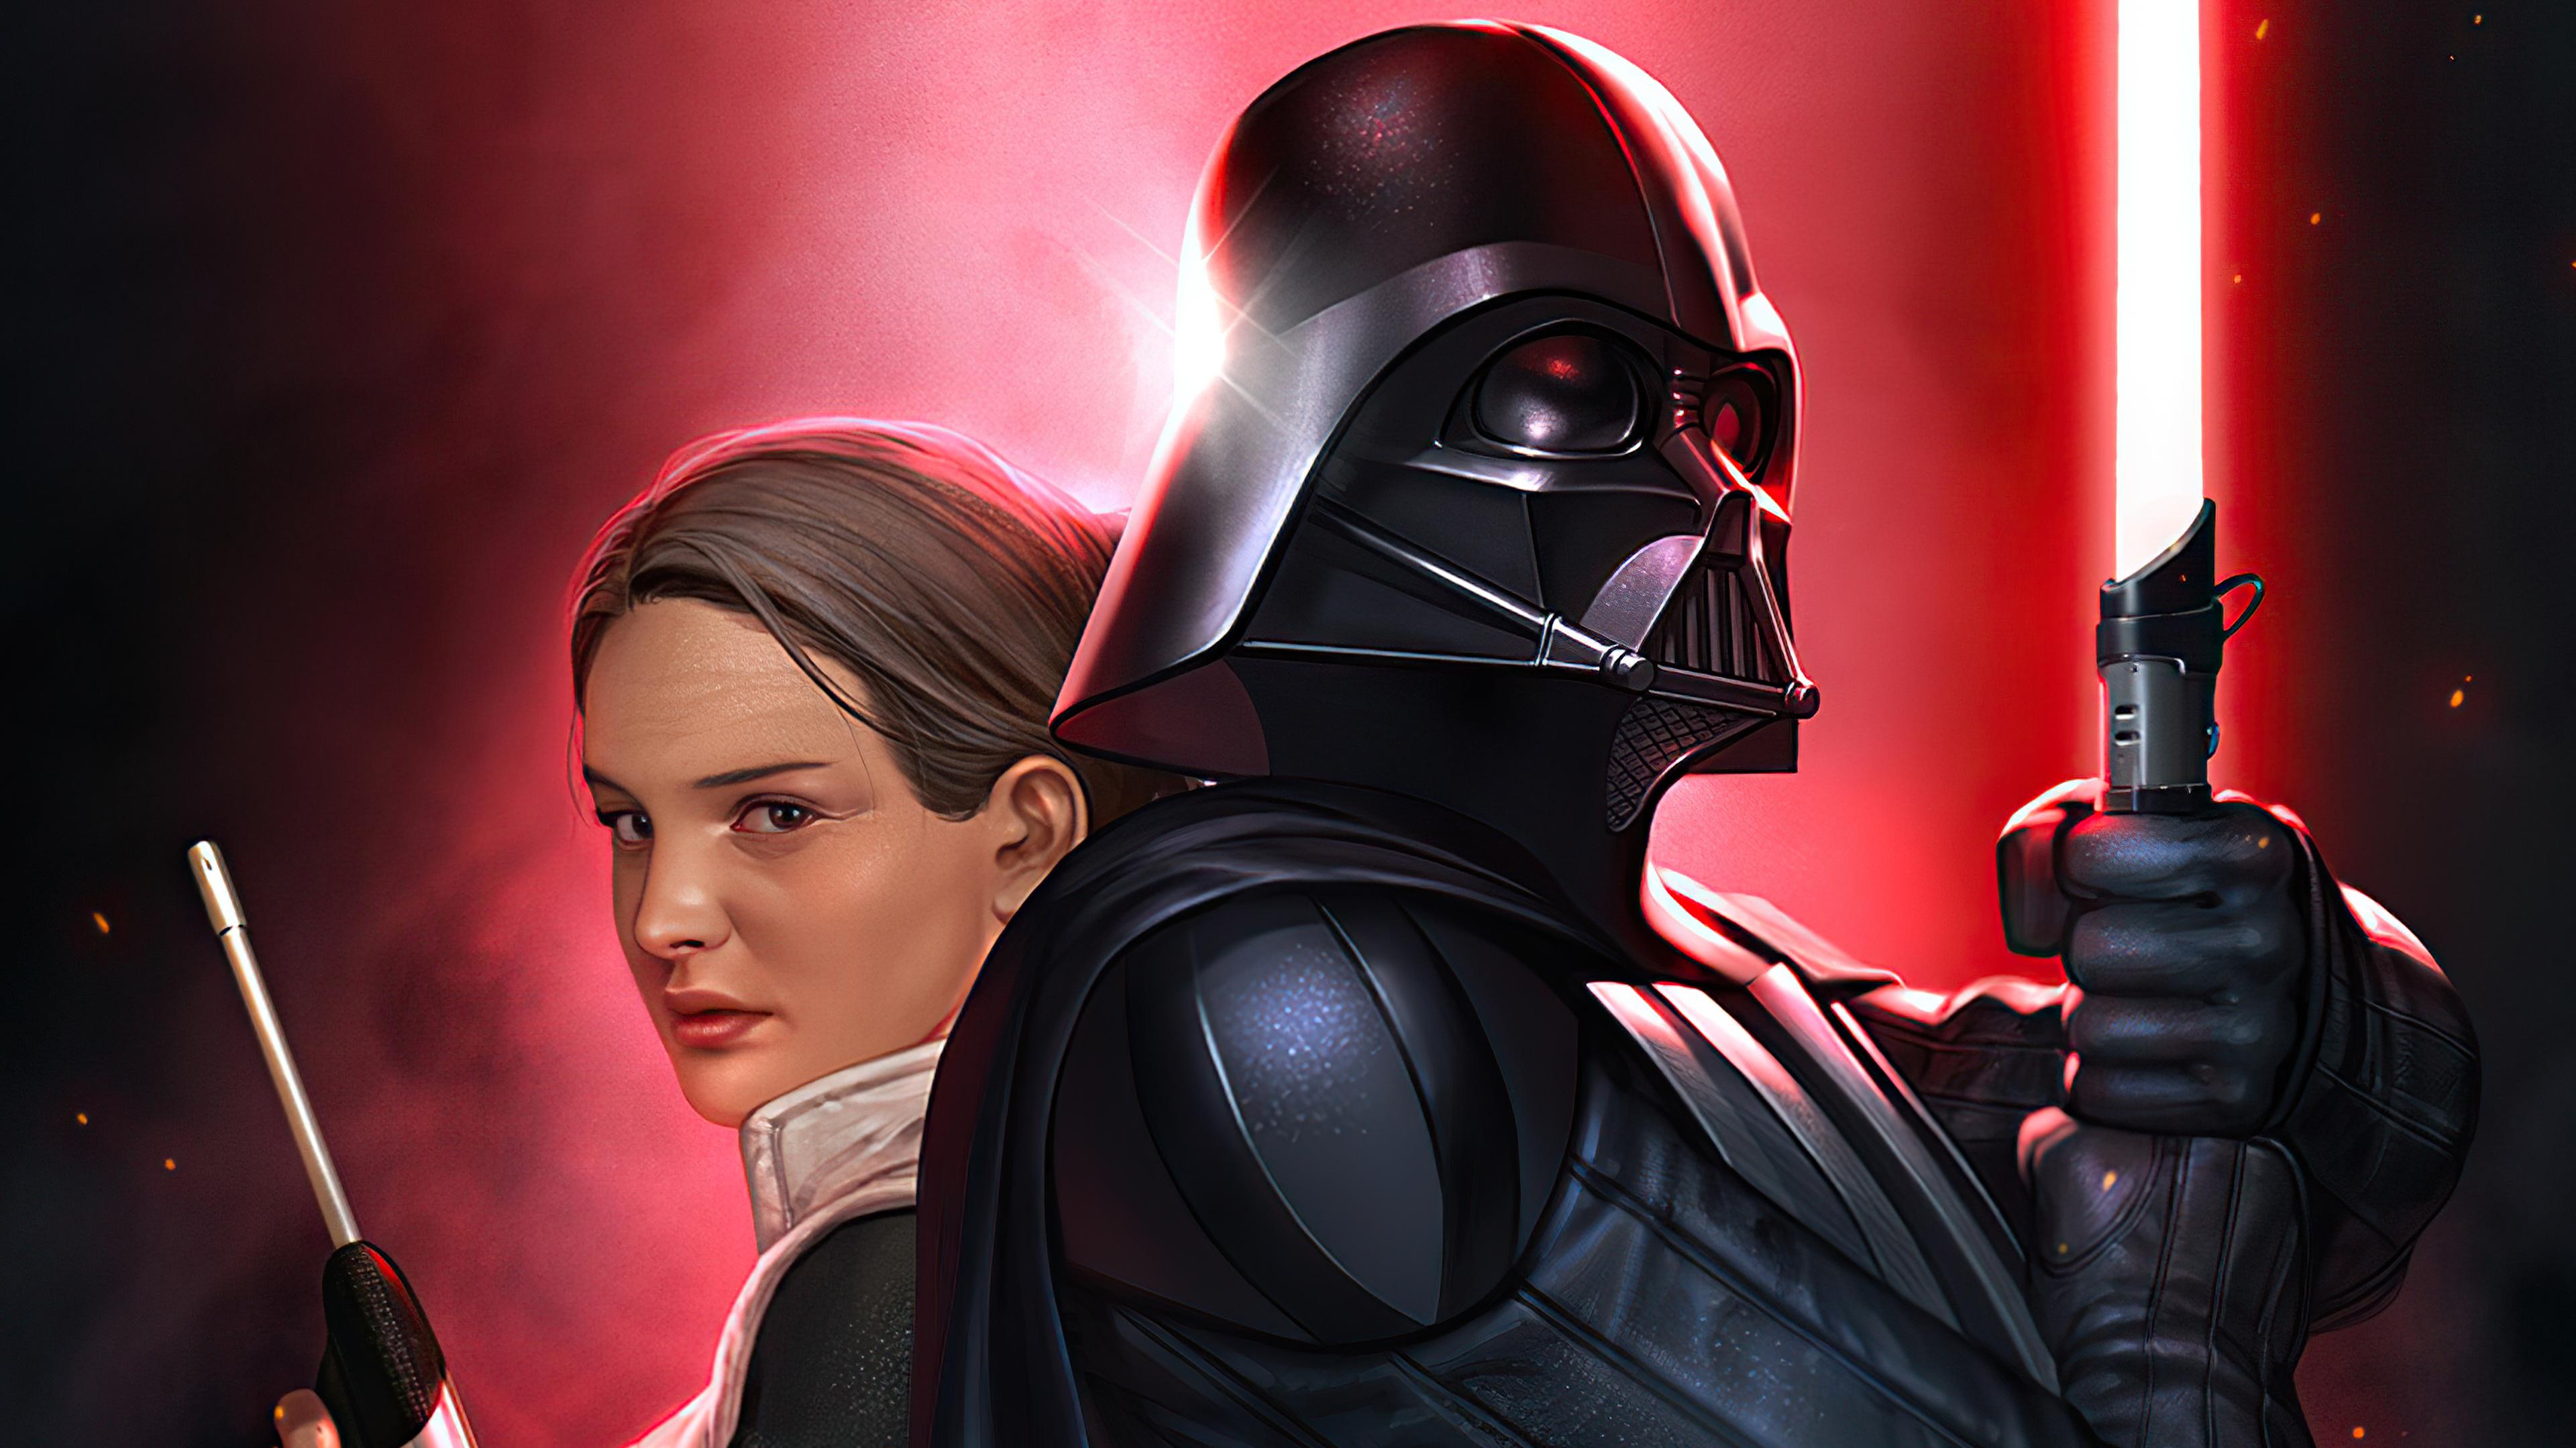 star wars darth vader 4k 1609016886 - Star Wars Darth Vader 4k - Star Wars Darth Vader 4k wallpapers